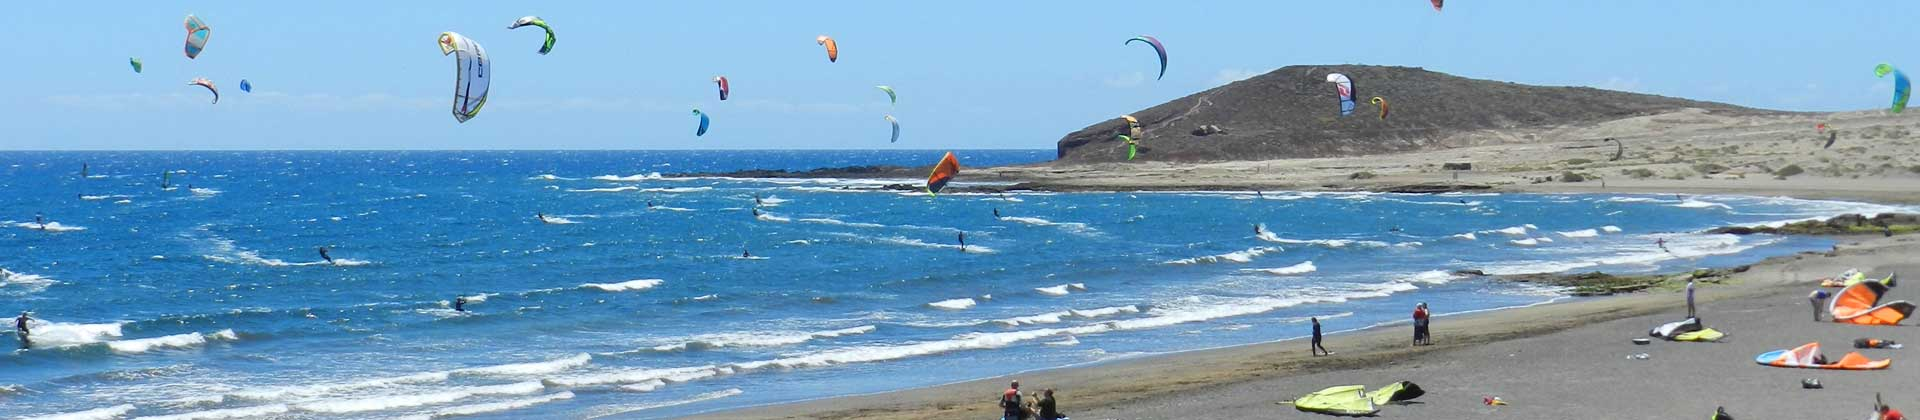 https://www.goodmorningtenerife.com/wp-content/uploads/2014/08/02_slide_windsurfing_GM_Tenerife.jpg